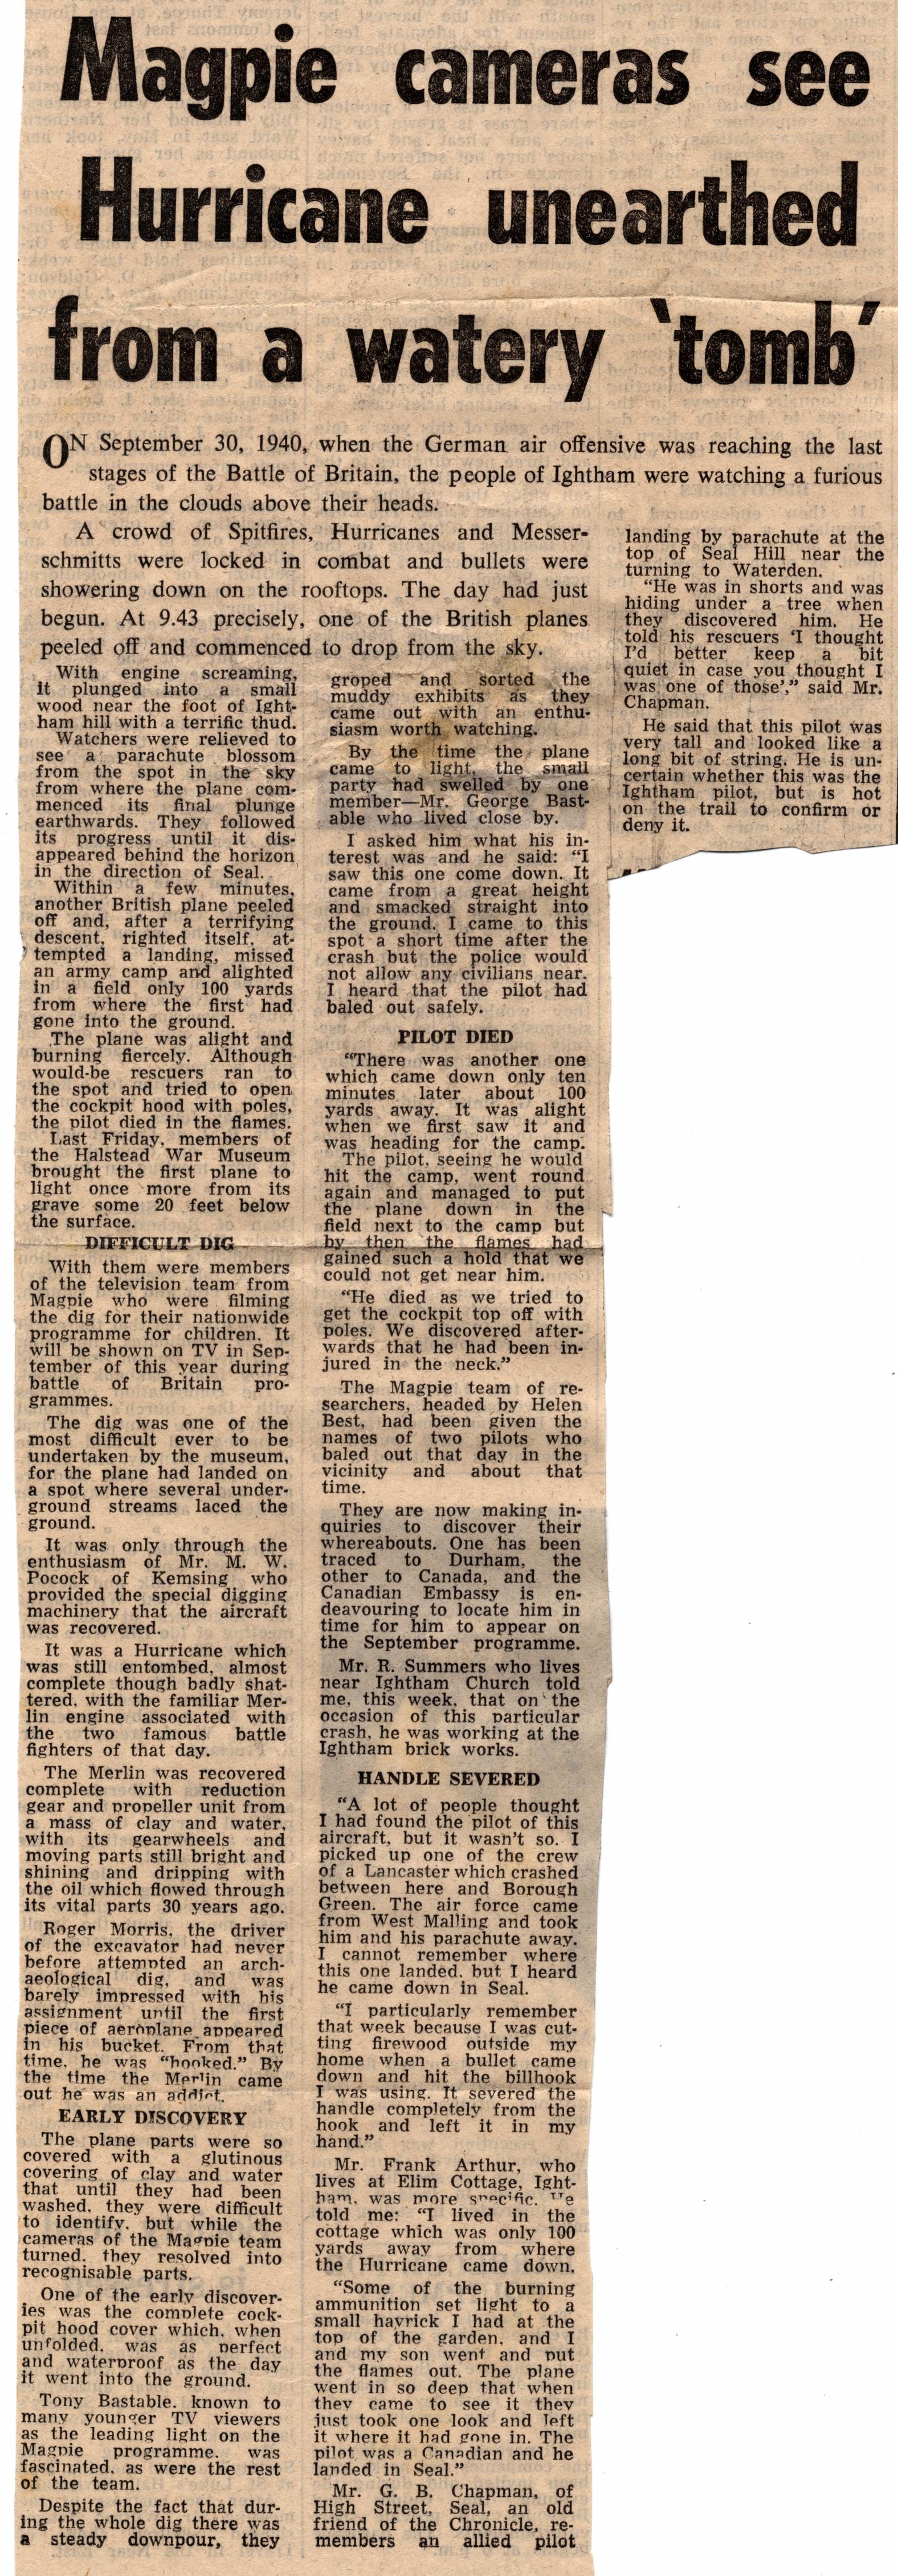 Sevenoaks Chronicle Article (June 1971)